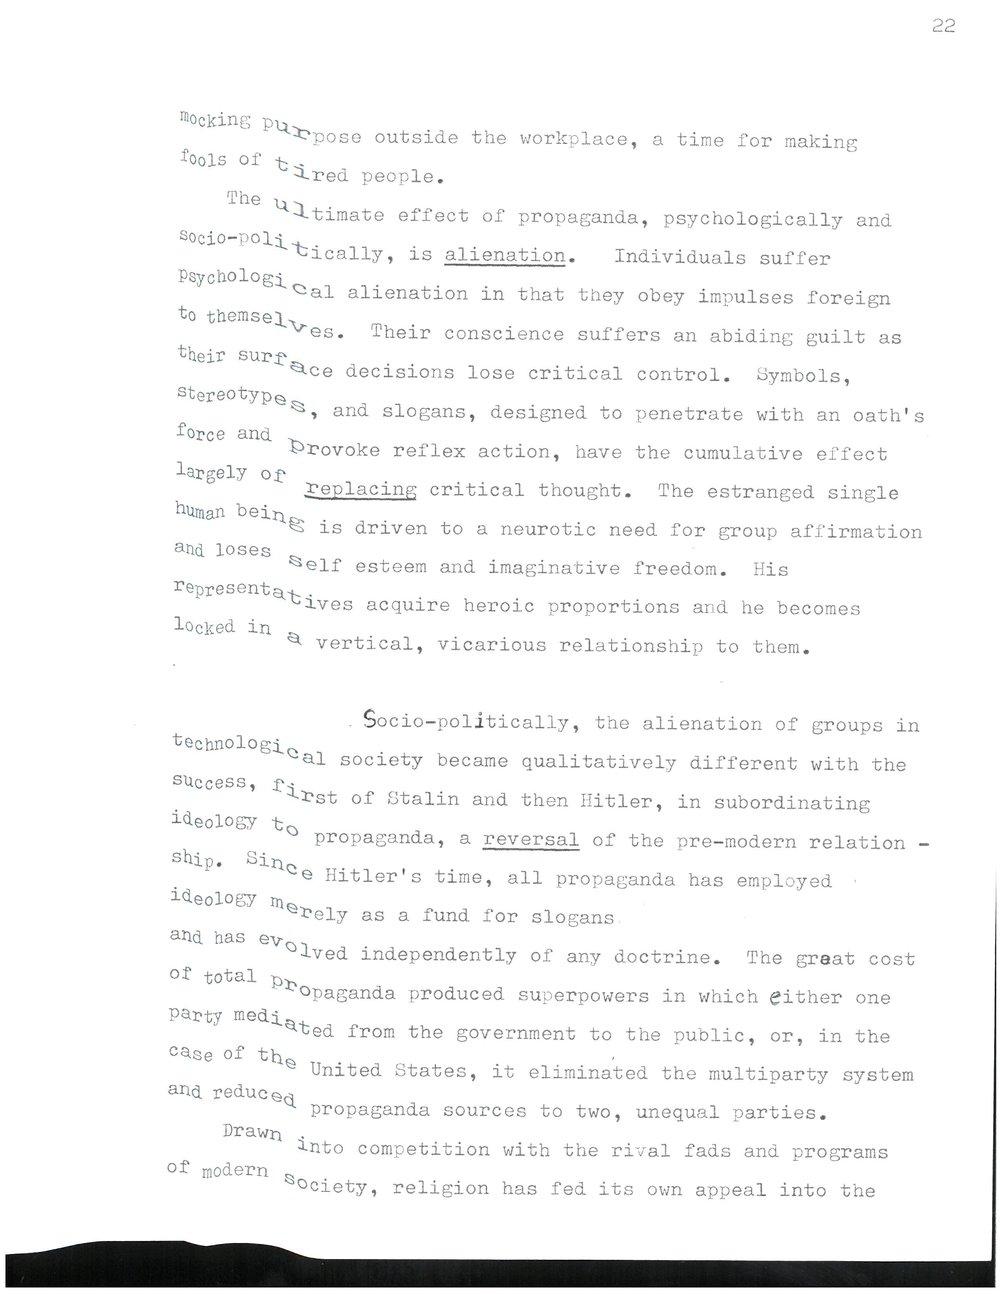 Propaganda_Page_24.jpg